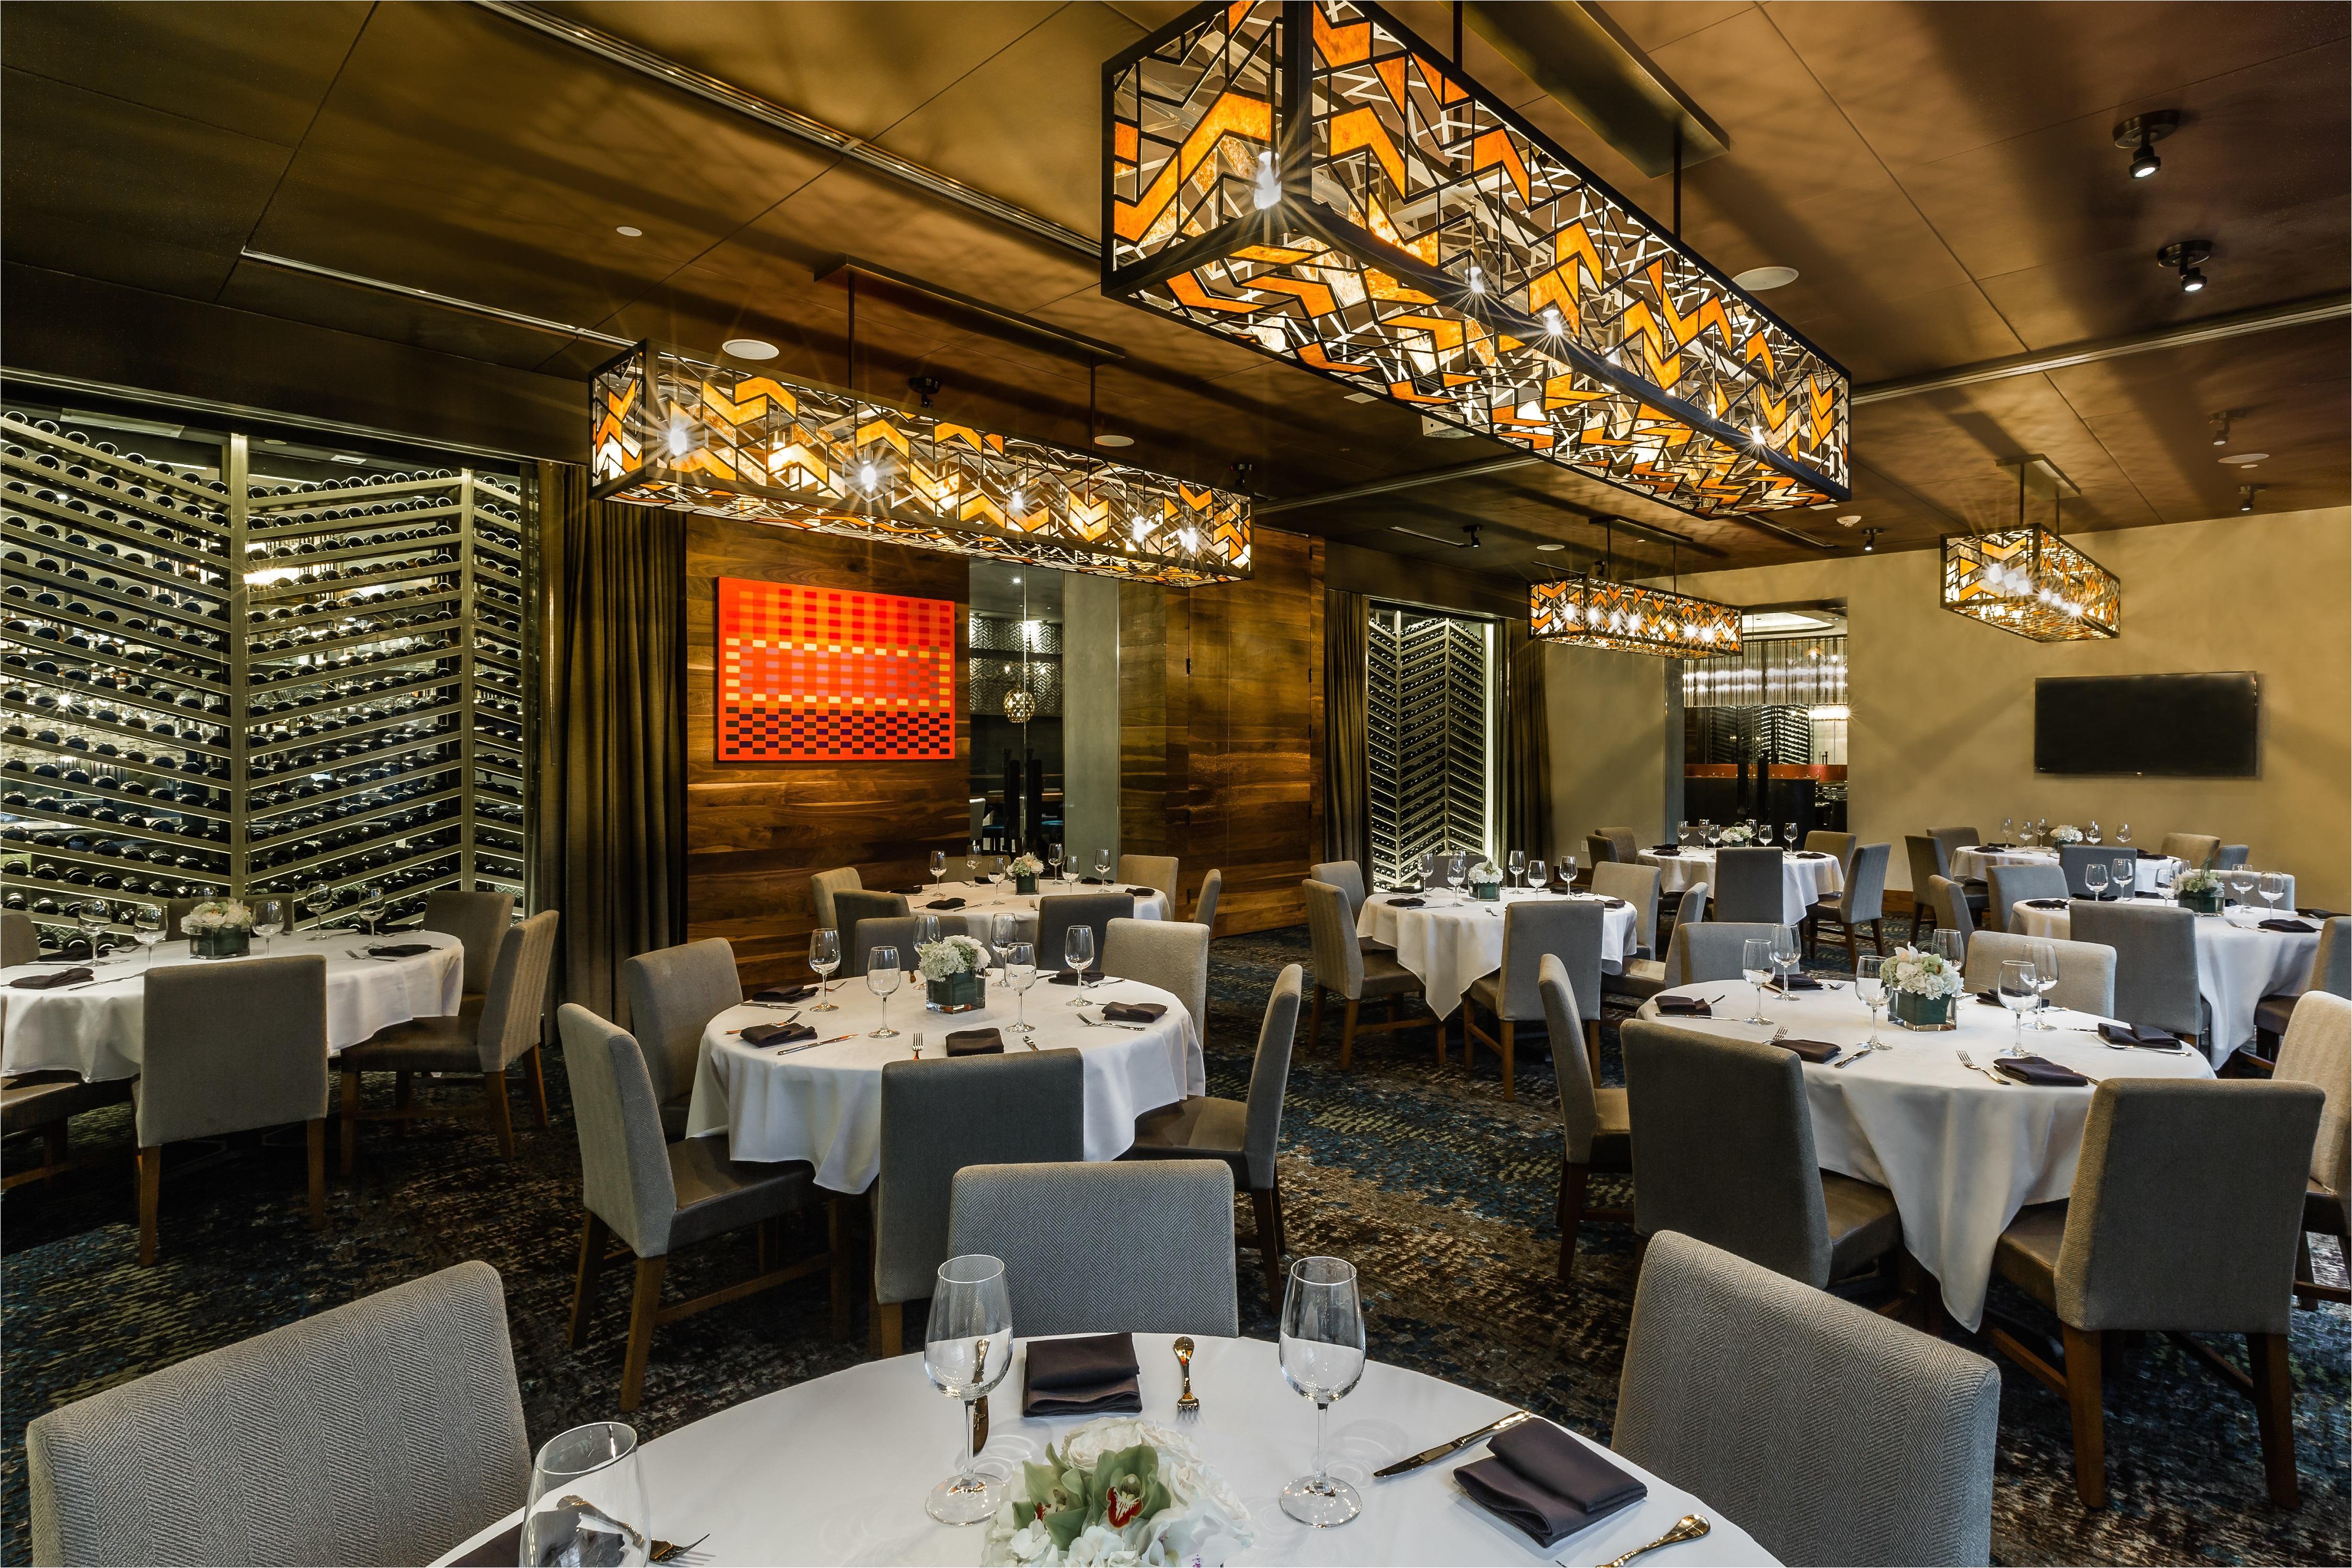 del frisco s double eagle steakhouse orlando grand cru whole cellar private dining room